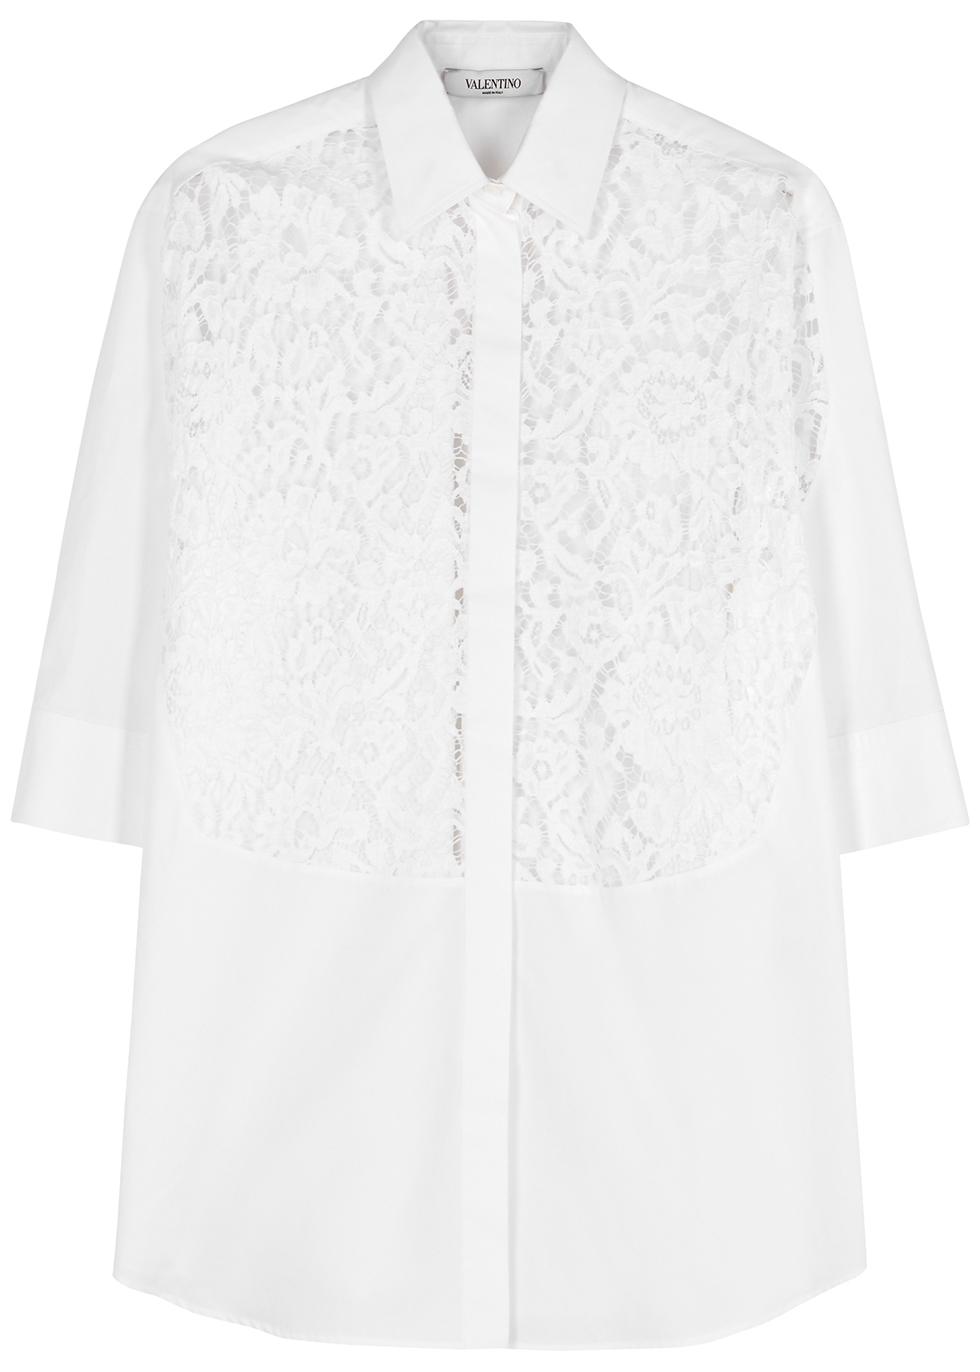 White lace-panelled cotton shirt